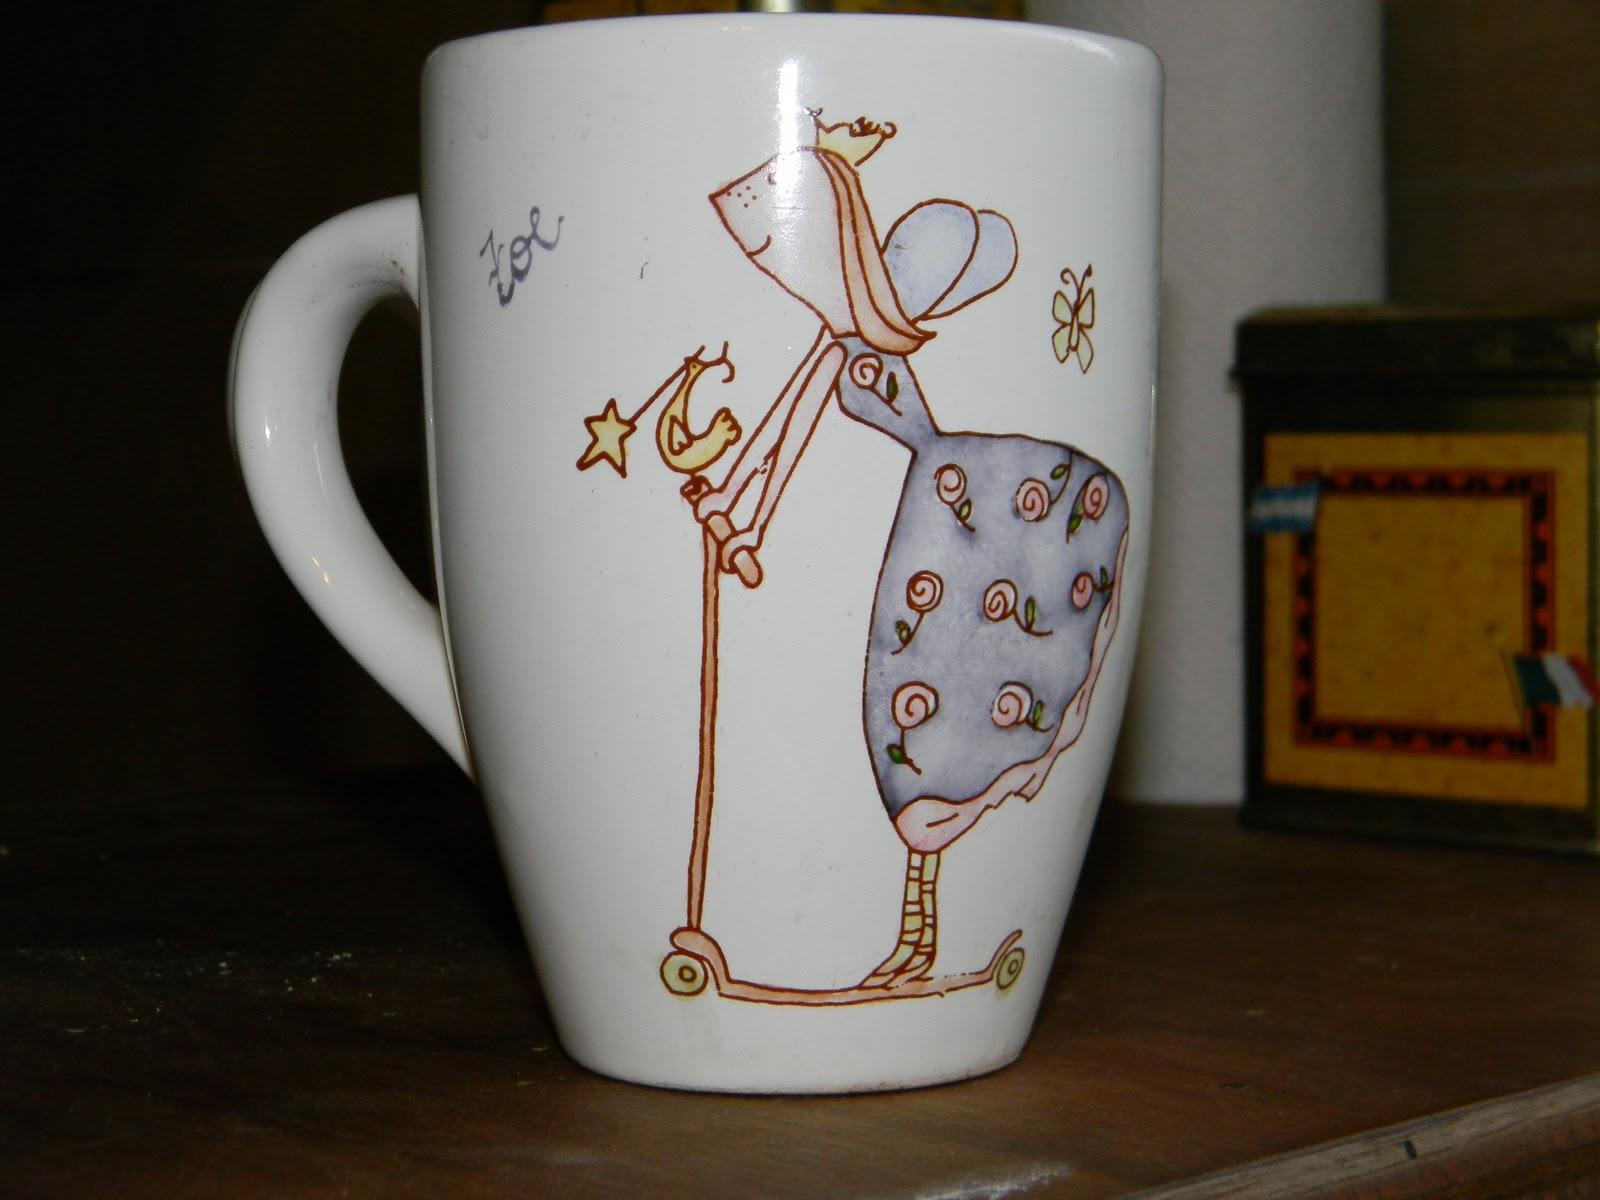 Vajilla personalizada tazas pintadas a mano - Vajillas pintadas a mano ...